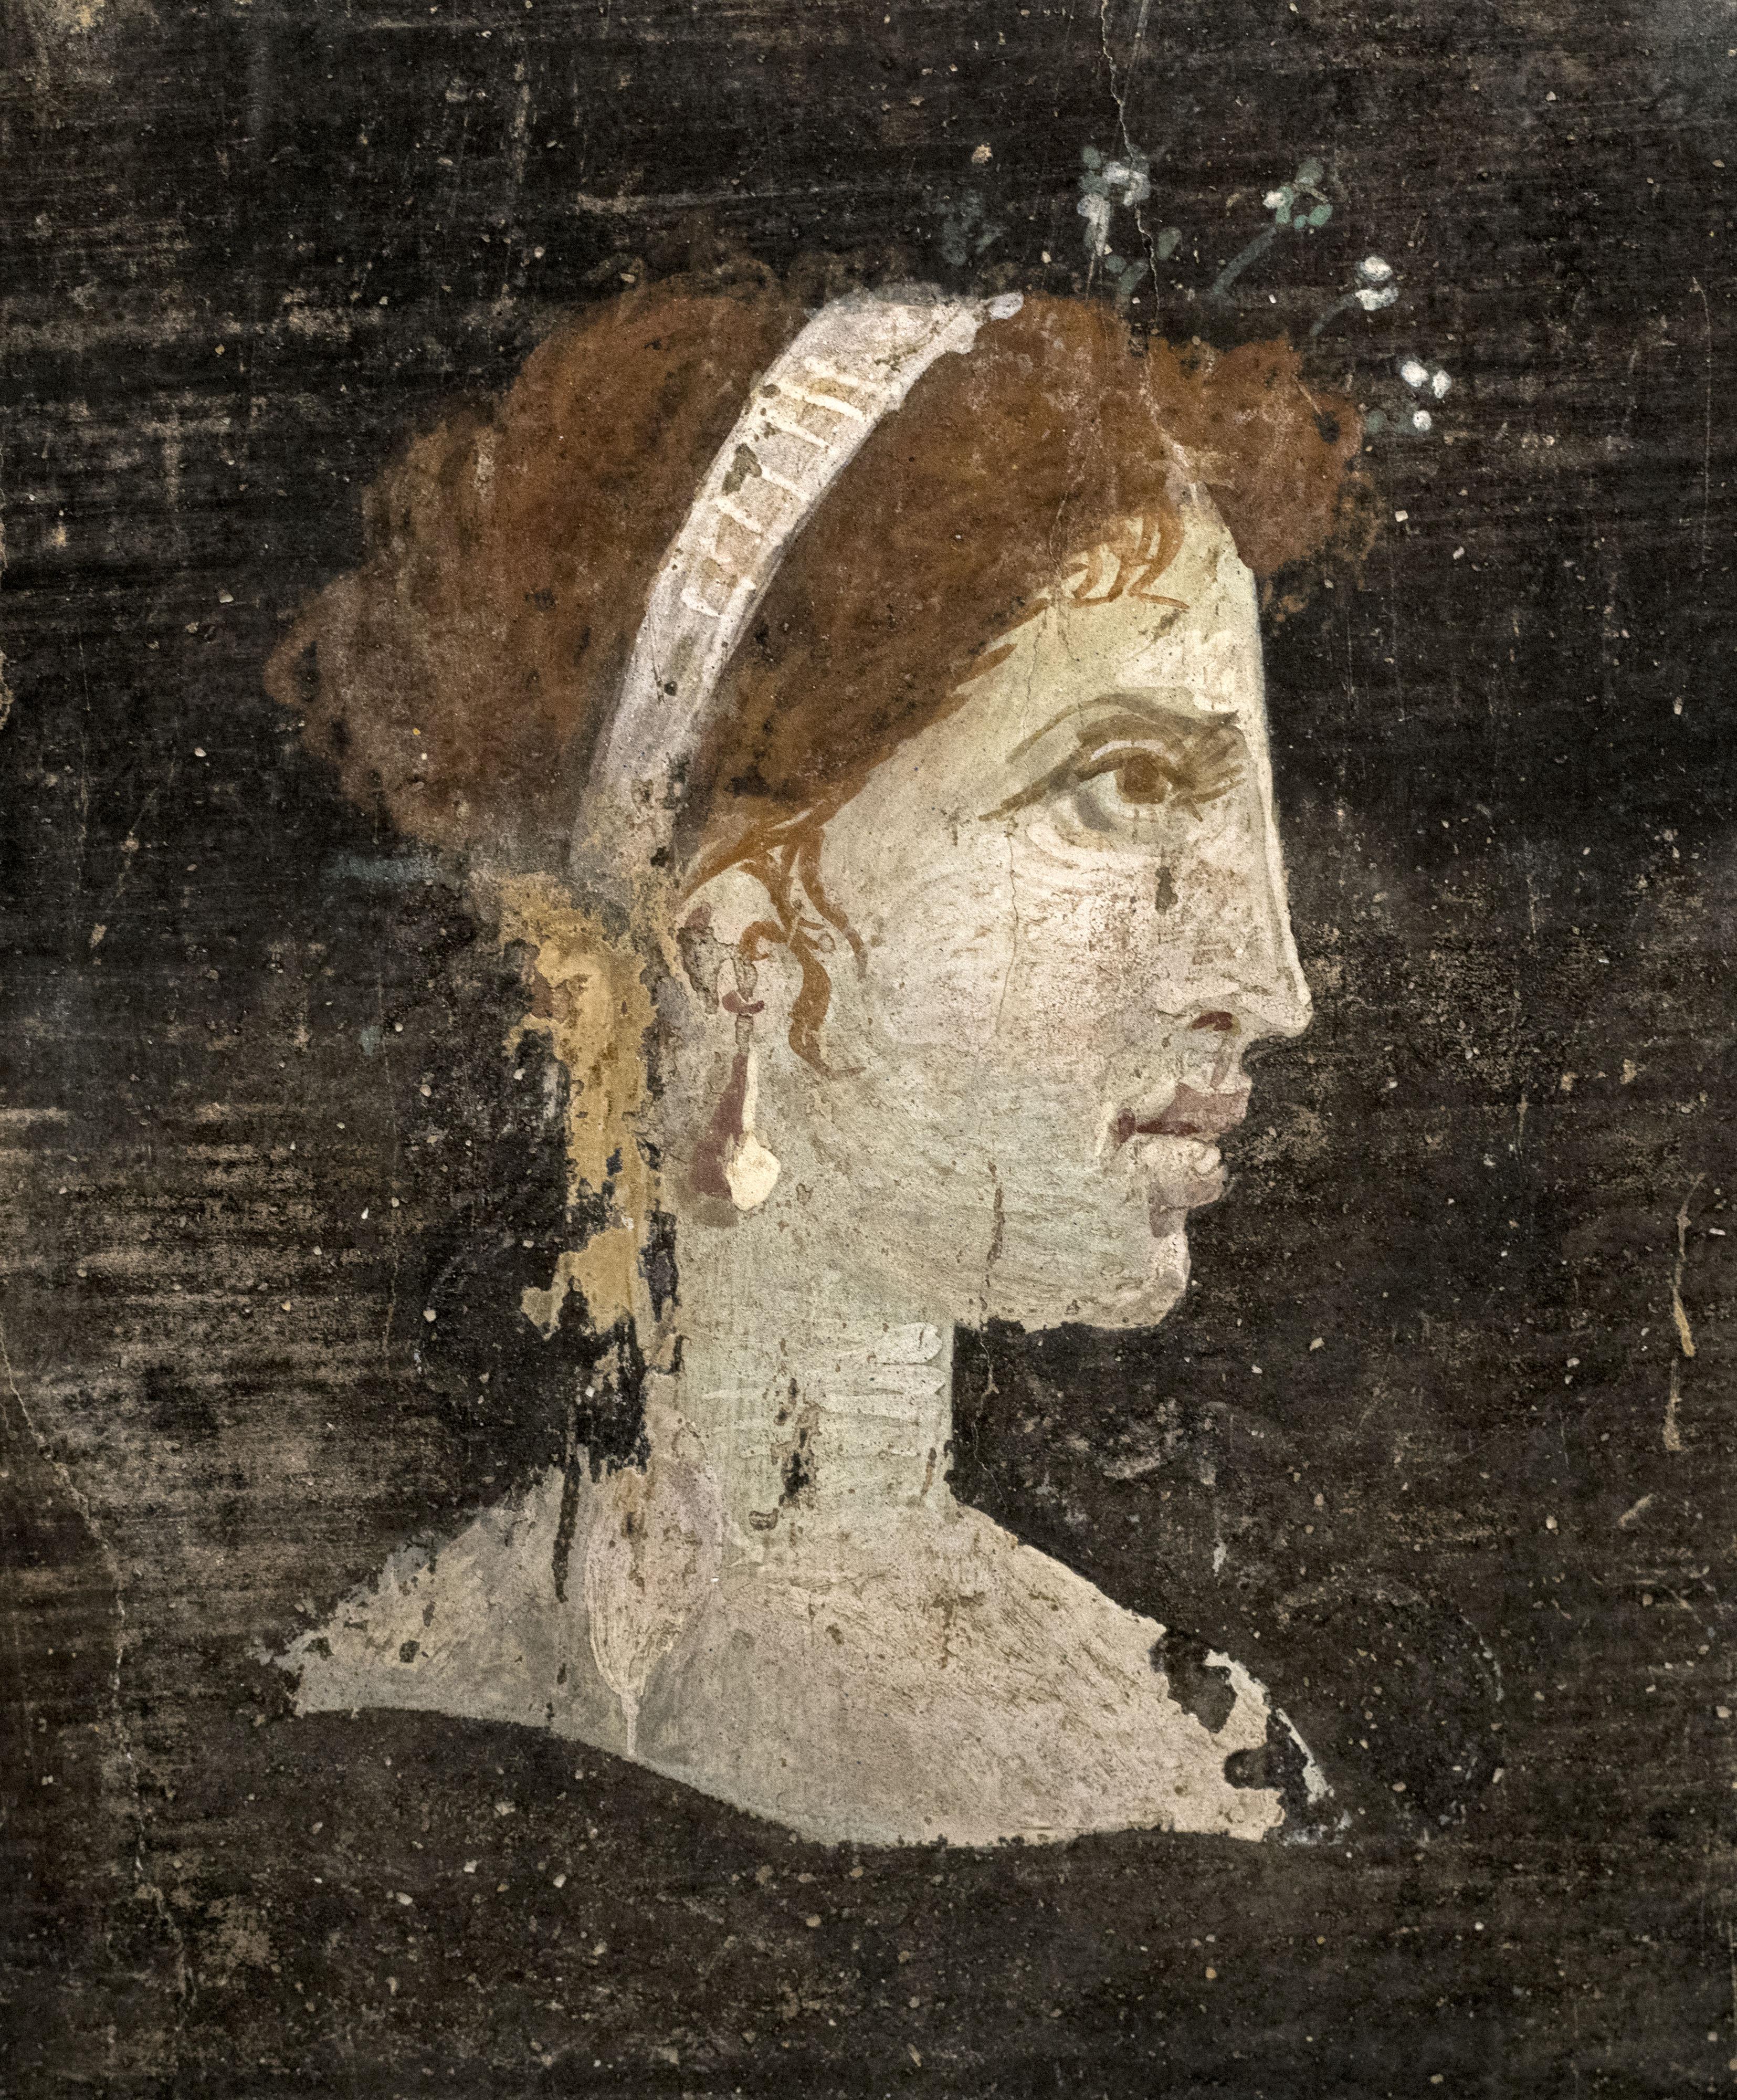 Uchronies romaines. - Page 8 Retrato_femenino_%2826771127162%29